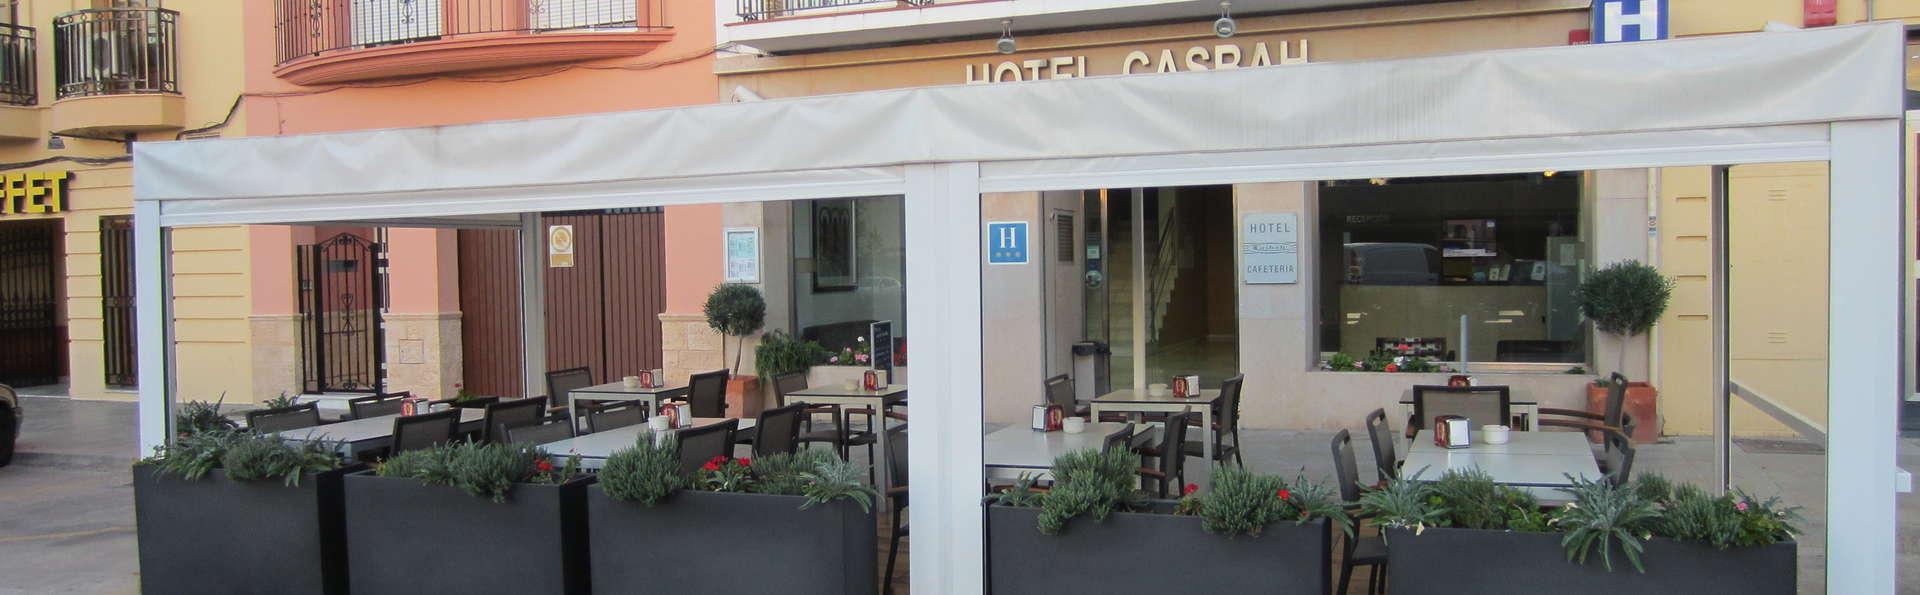 Hotel Casbah (inactif) - IMG_4872.JPG